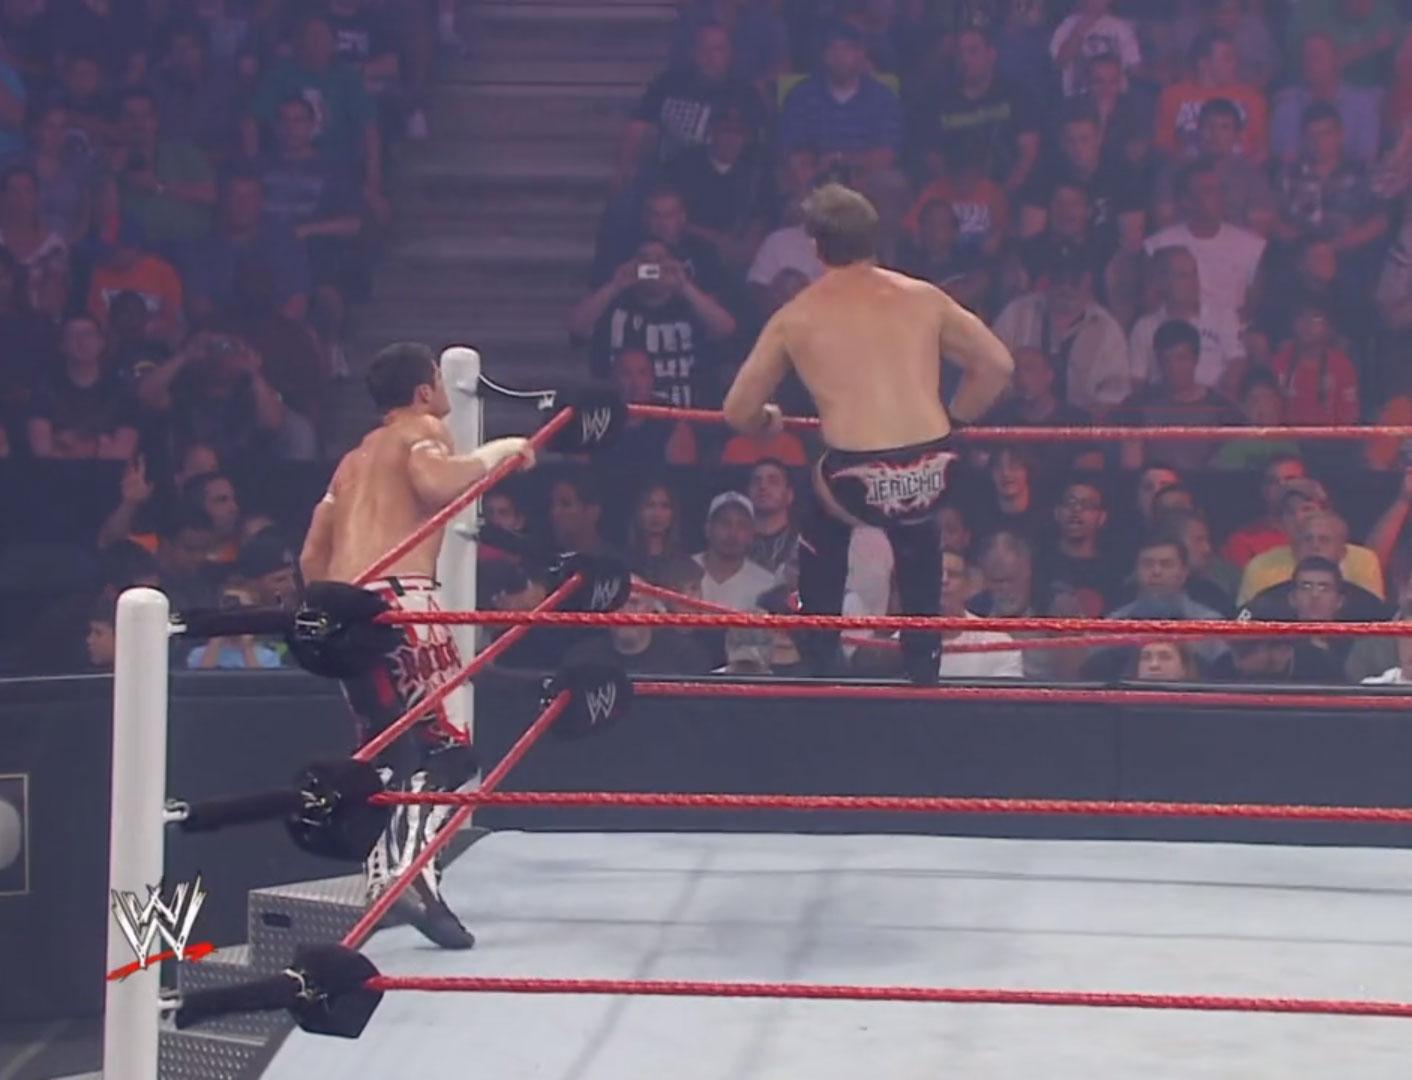 Evan Bourne vs. Chris Jericho WWE Fatal 4-Way Jun 20th 2010